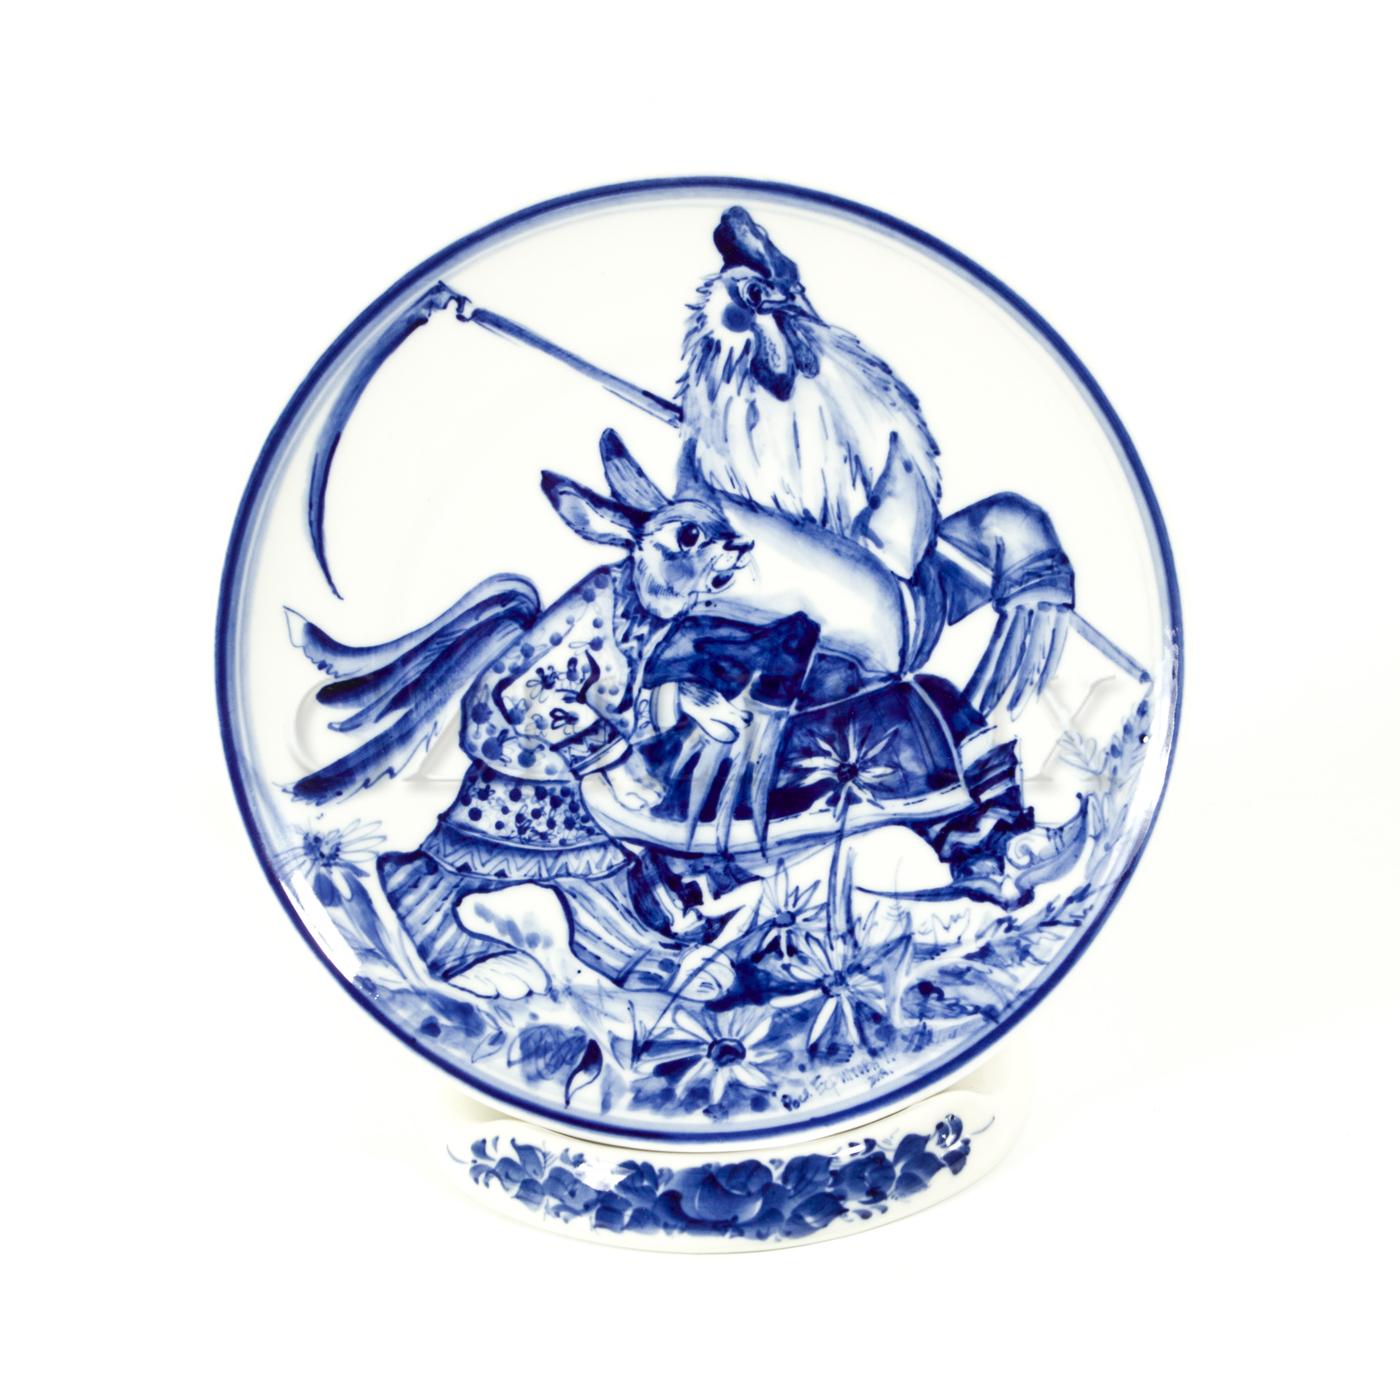 Тарелка декоративная «Петух и Заяц»